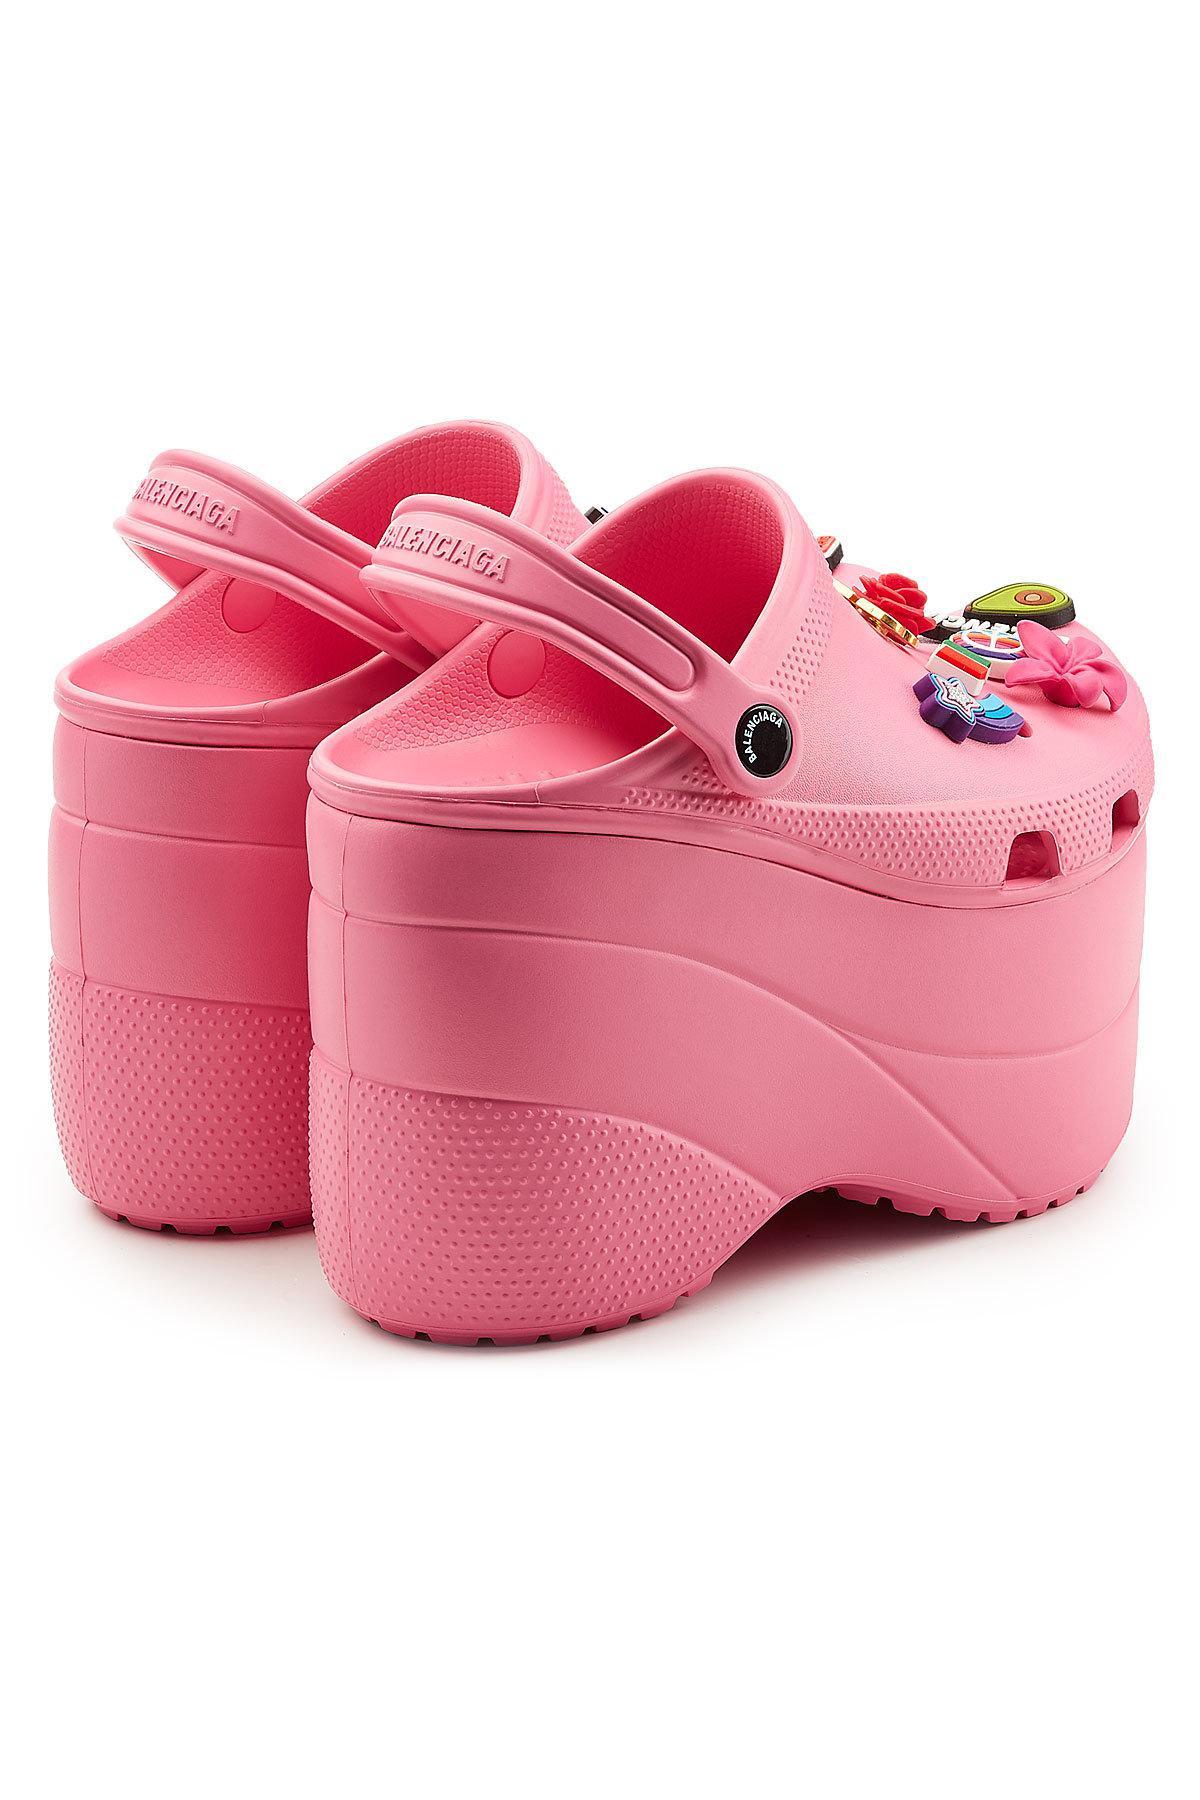 Lyst Balenciaga Platform Crocs In Pink